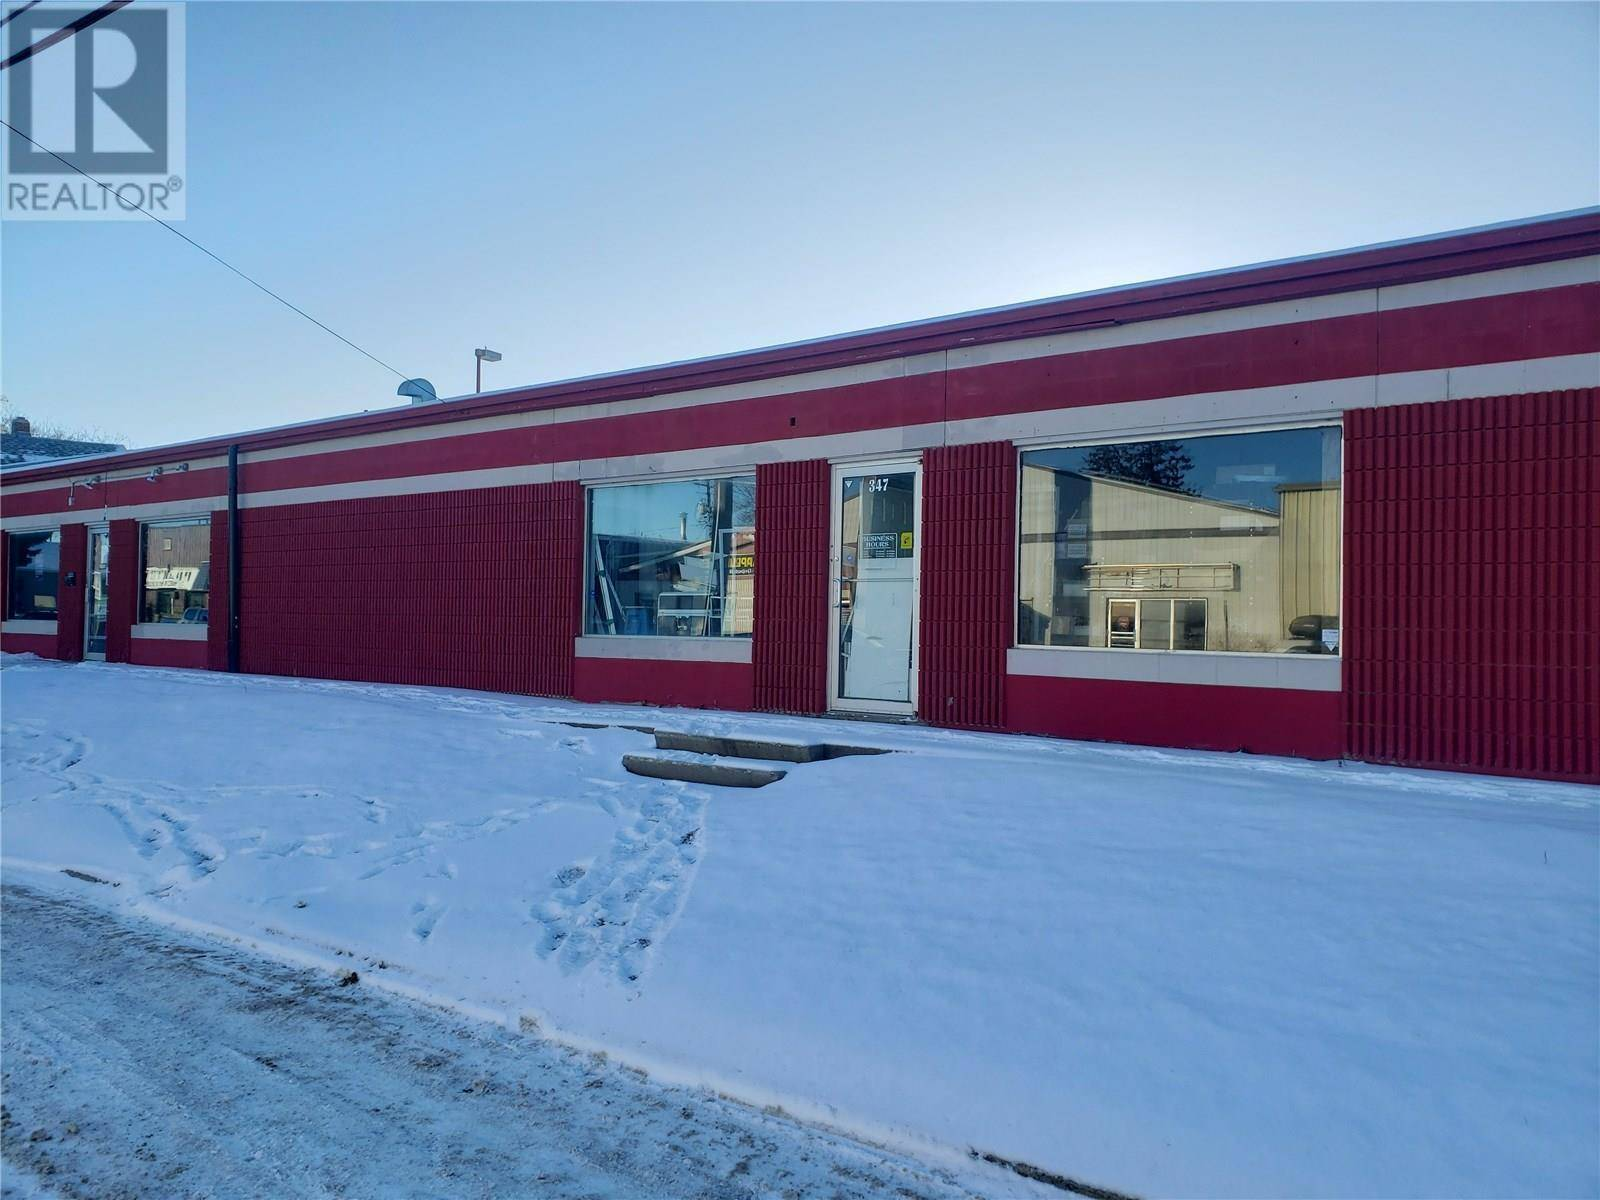 Property for rent at 347 16th St W Unit 341 Prince Albert Saskatchewan - MLS: SK793664